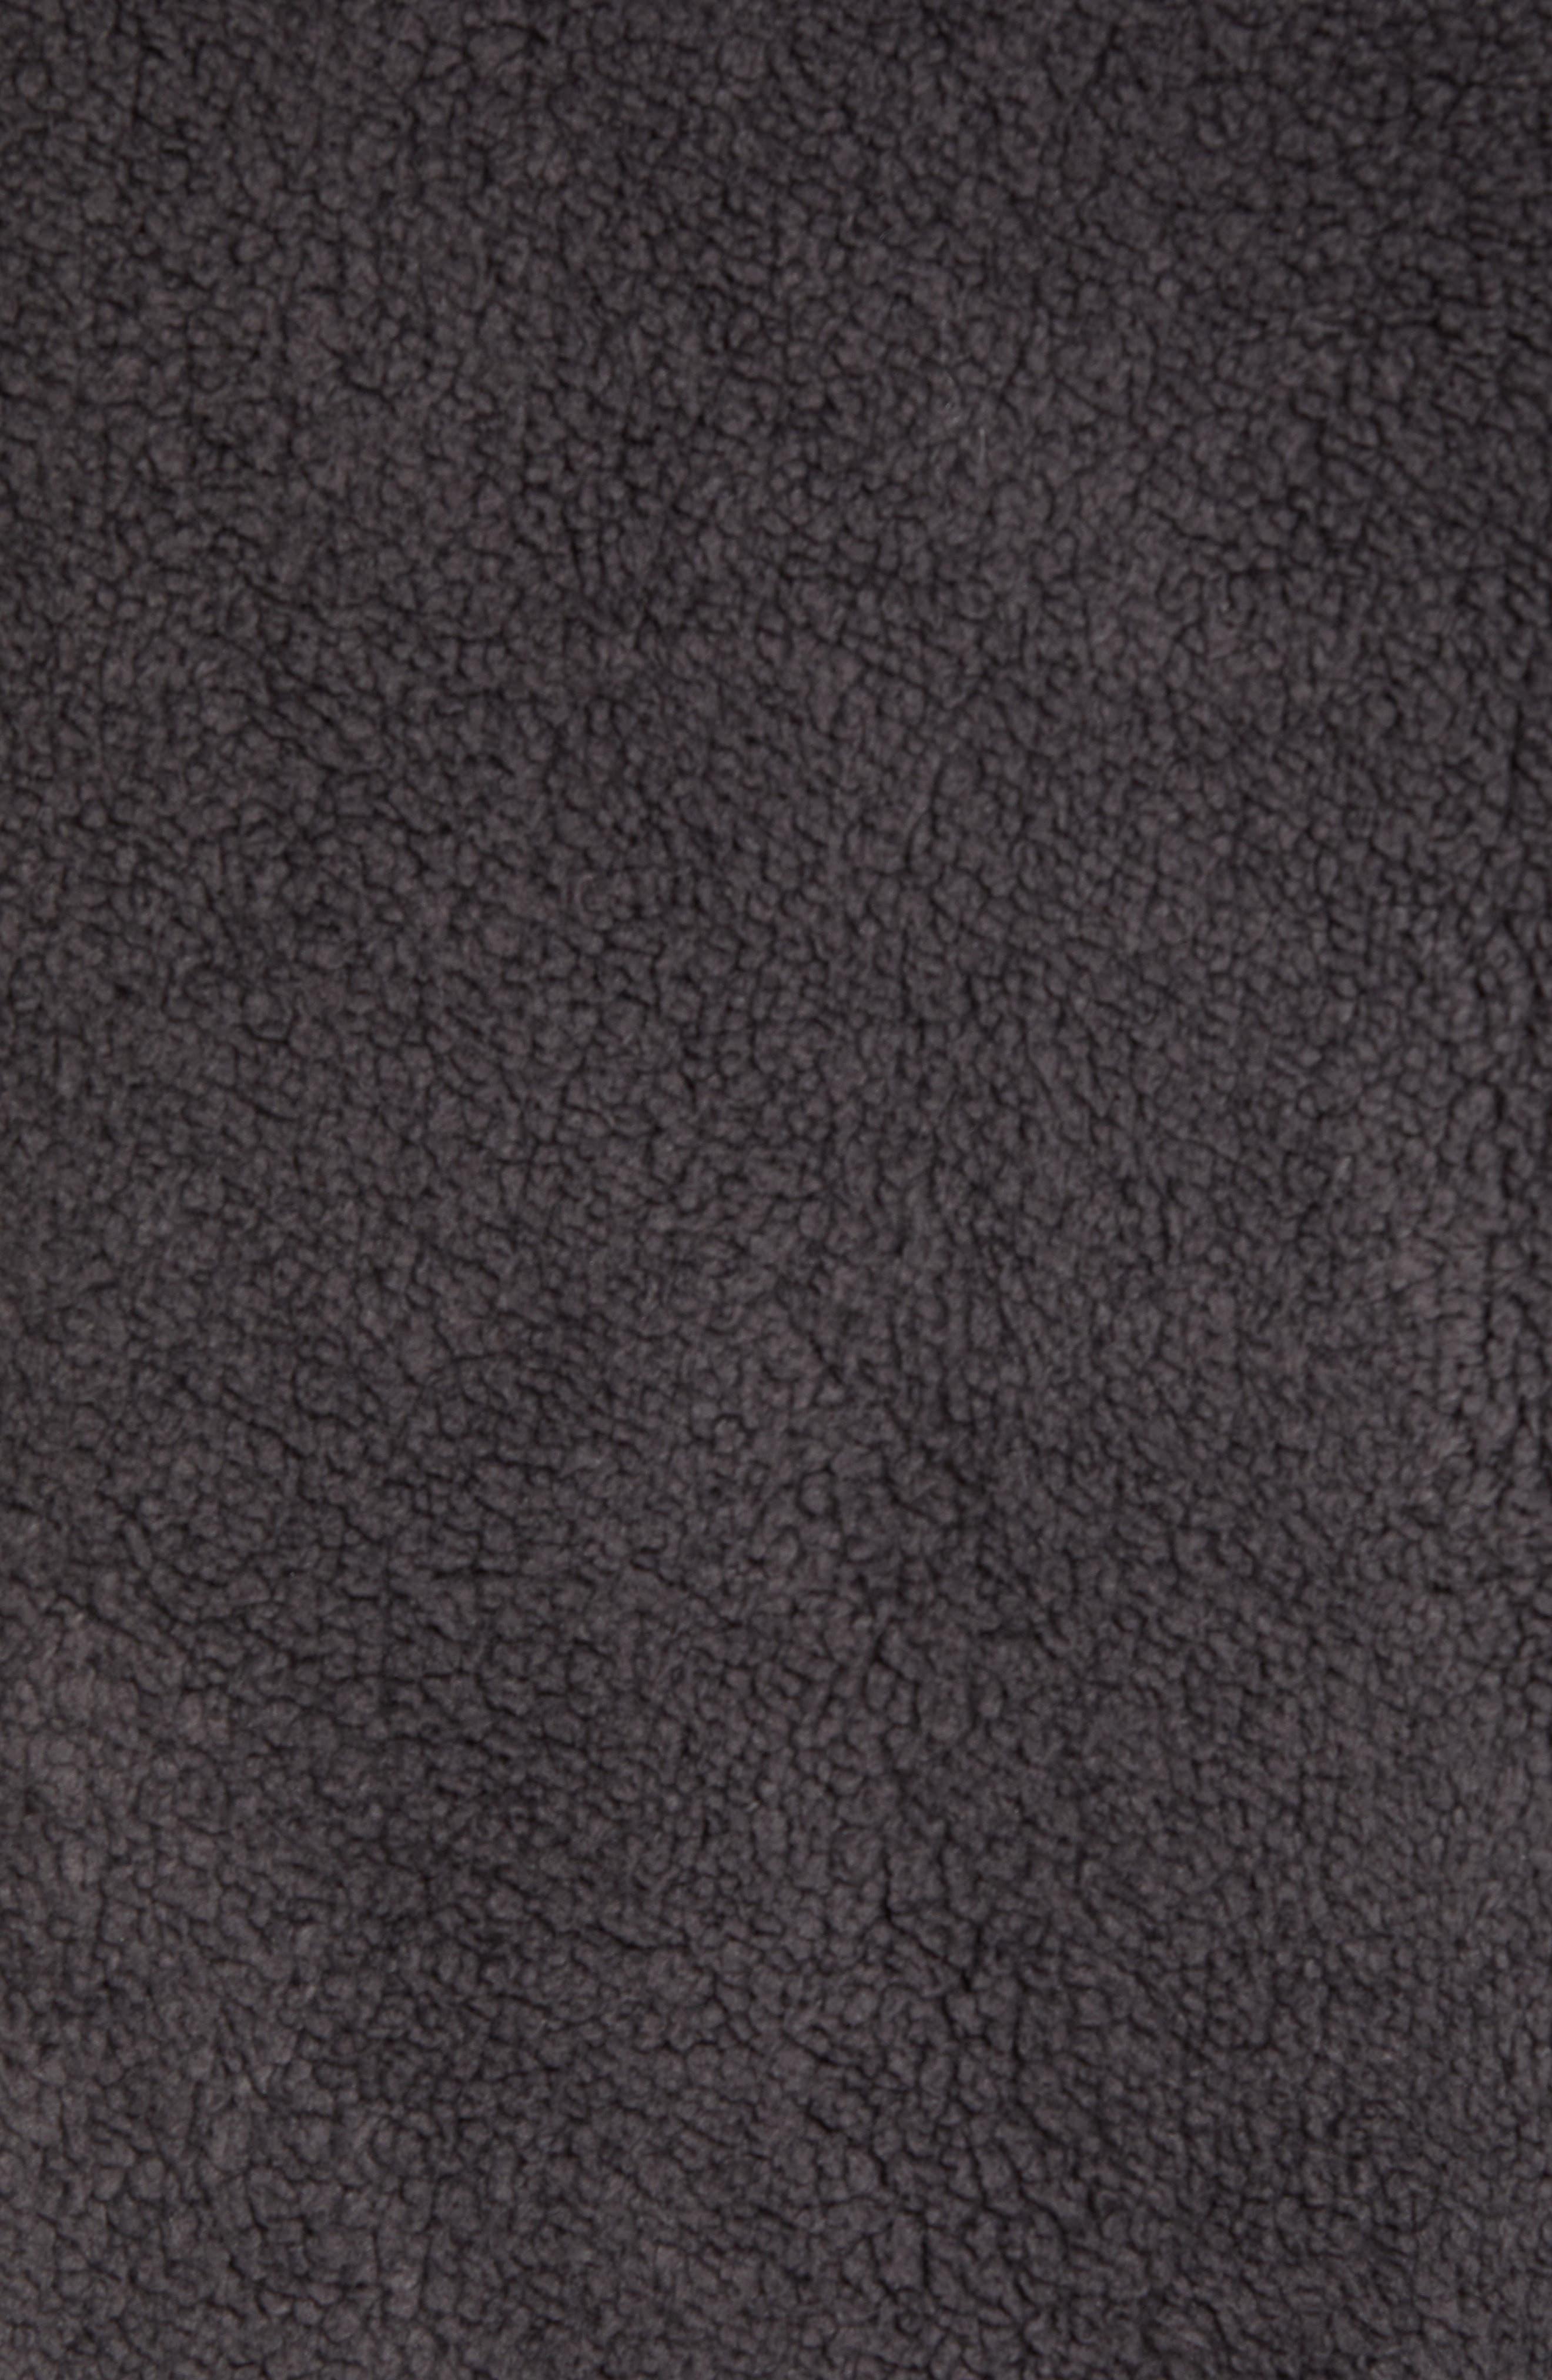 UGG<SUP>®</SUP>, Lucas High Pile Fleece Sweater Jacket, Alternate thumbnail 6, color, CHARCOAL